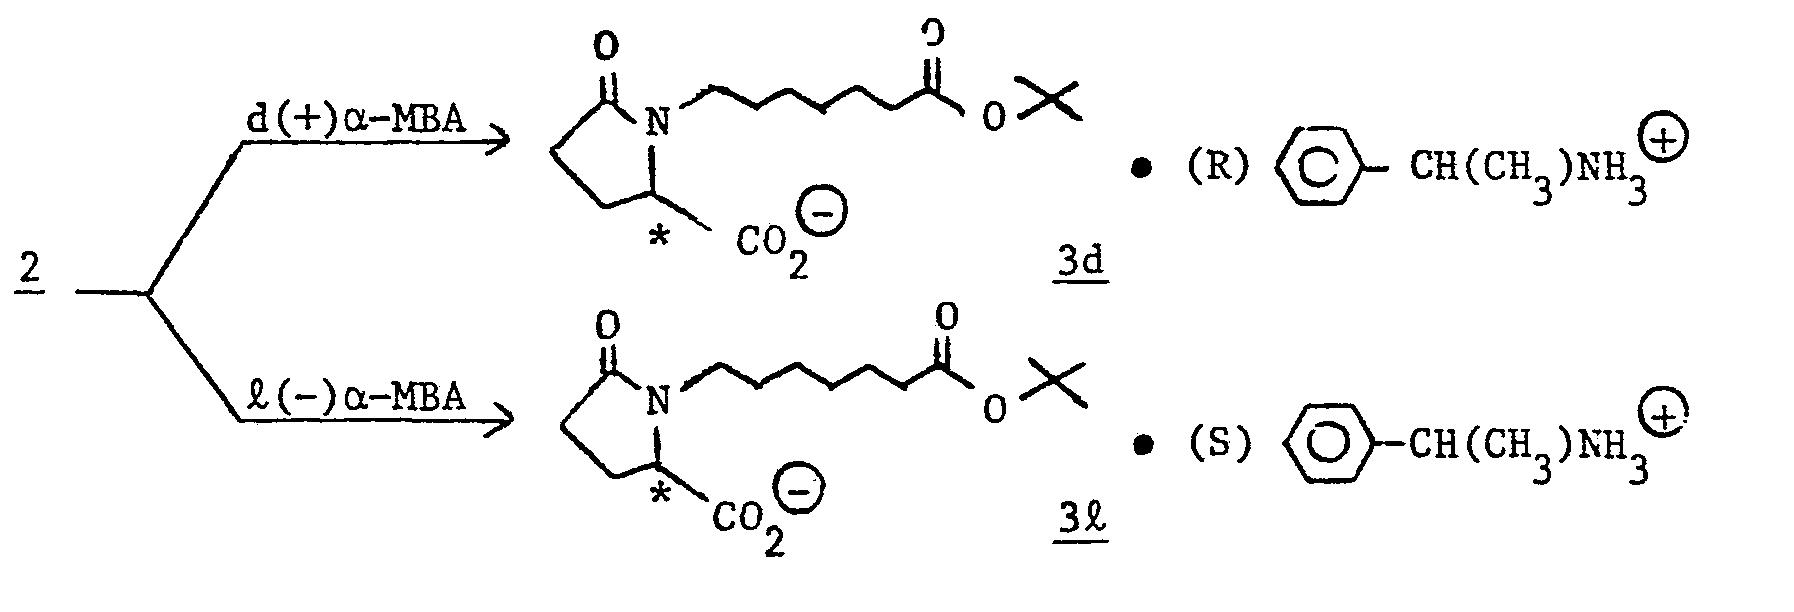 Figure imgb0072